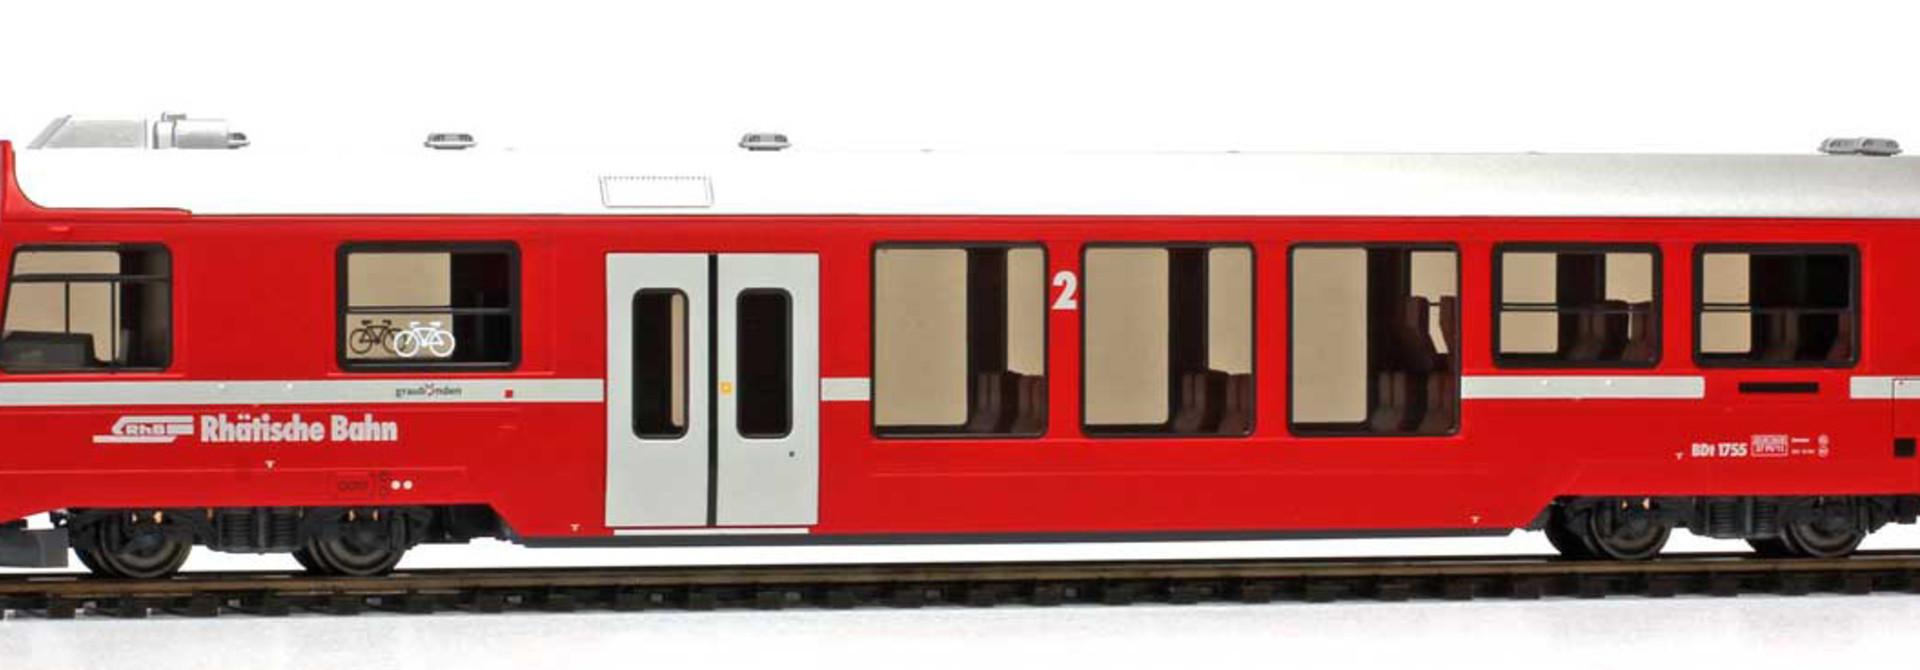 3249111 RhB BDt 1751 Steuerwagen NEVA-Retica neurot